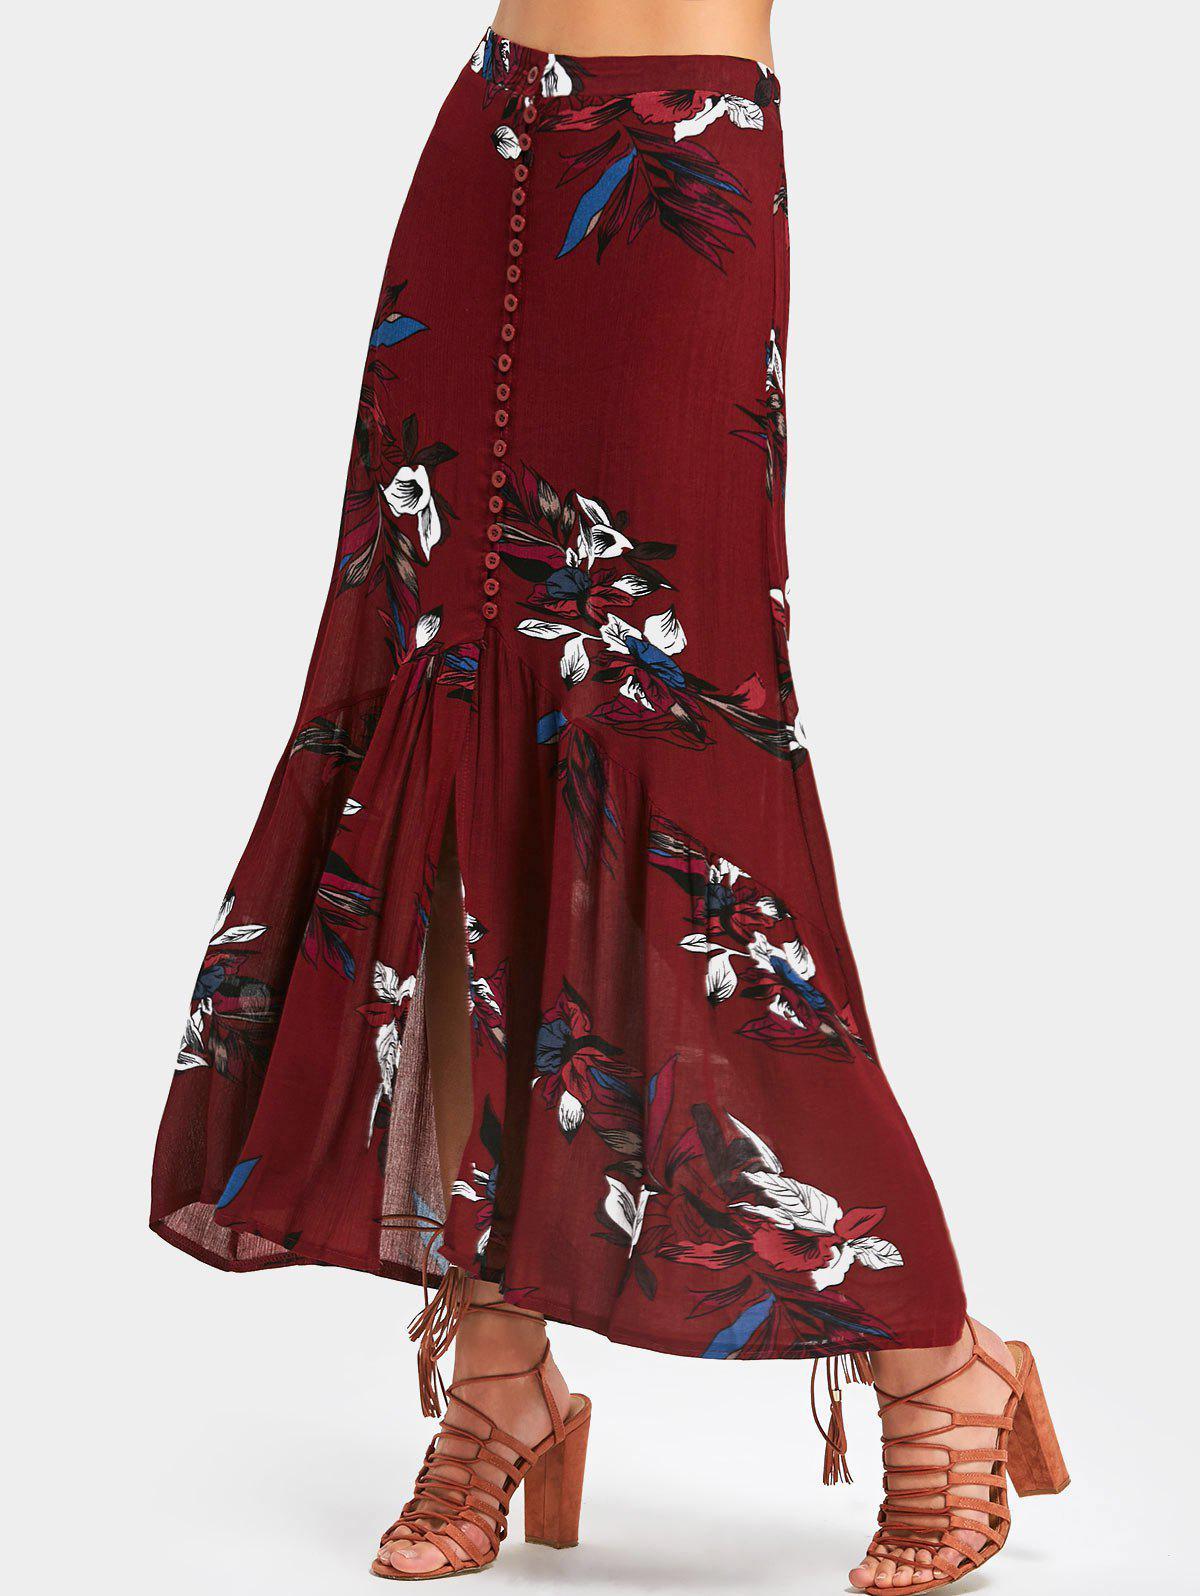 Hoher Taillierter Blumendruck Maxirock